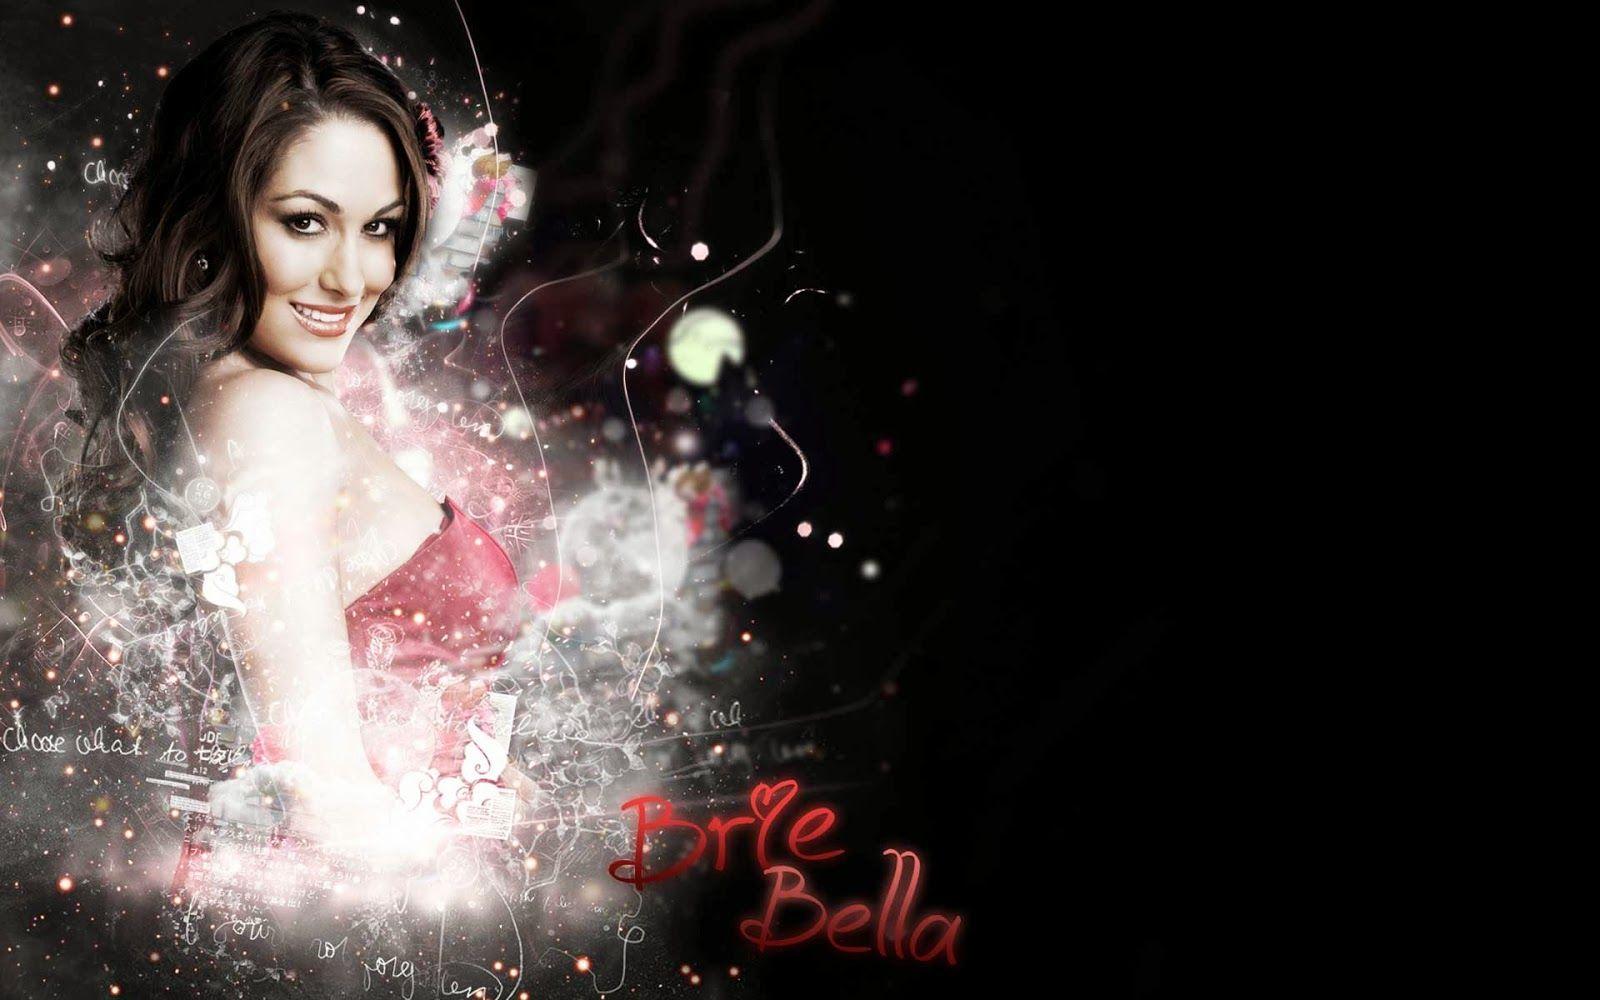 Brie Bella Hd Wallpapers 6 Brie Bella Brie Wallpaper